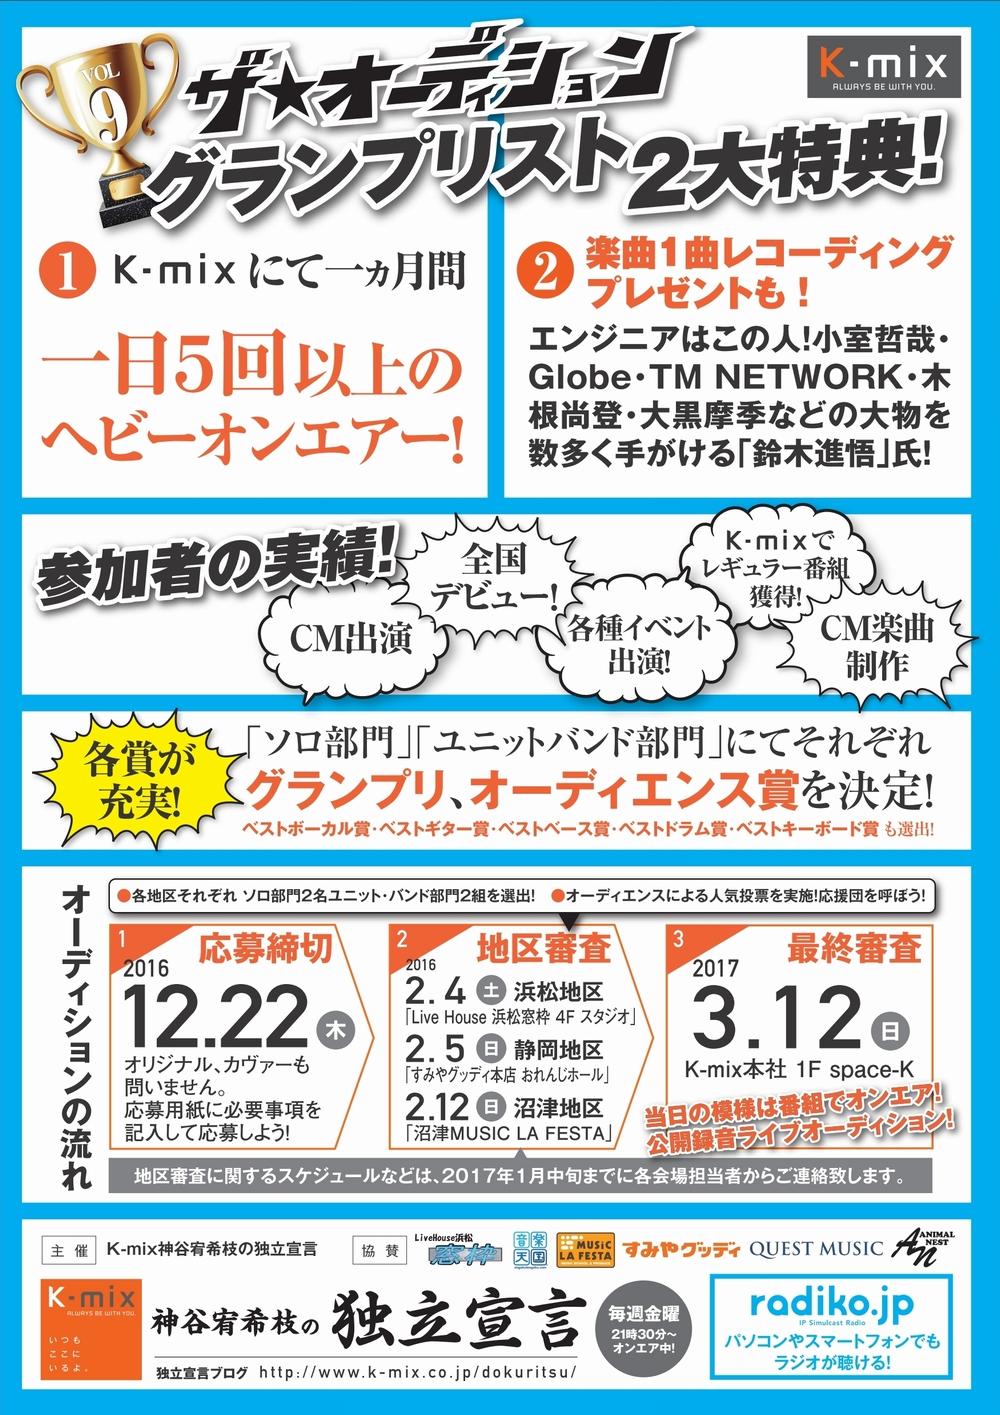 K-mix 神谷宥希枝の独立宣言「ザ・オーディション2017」詳細